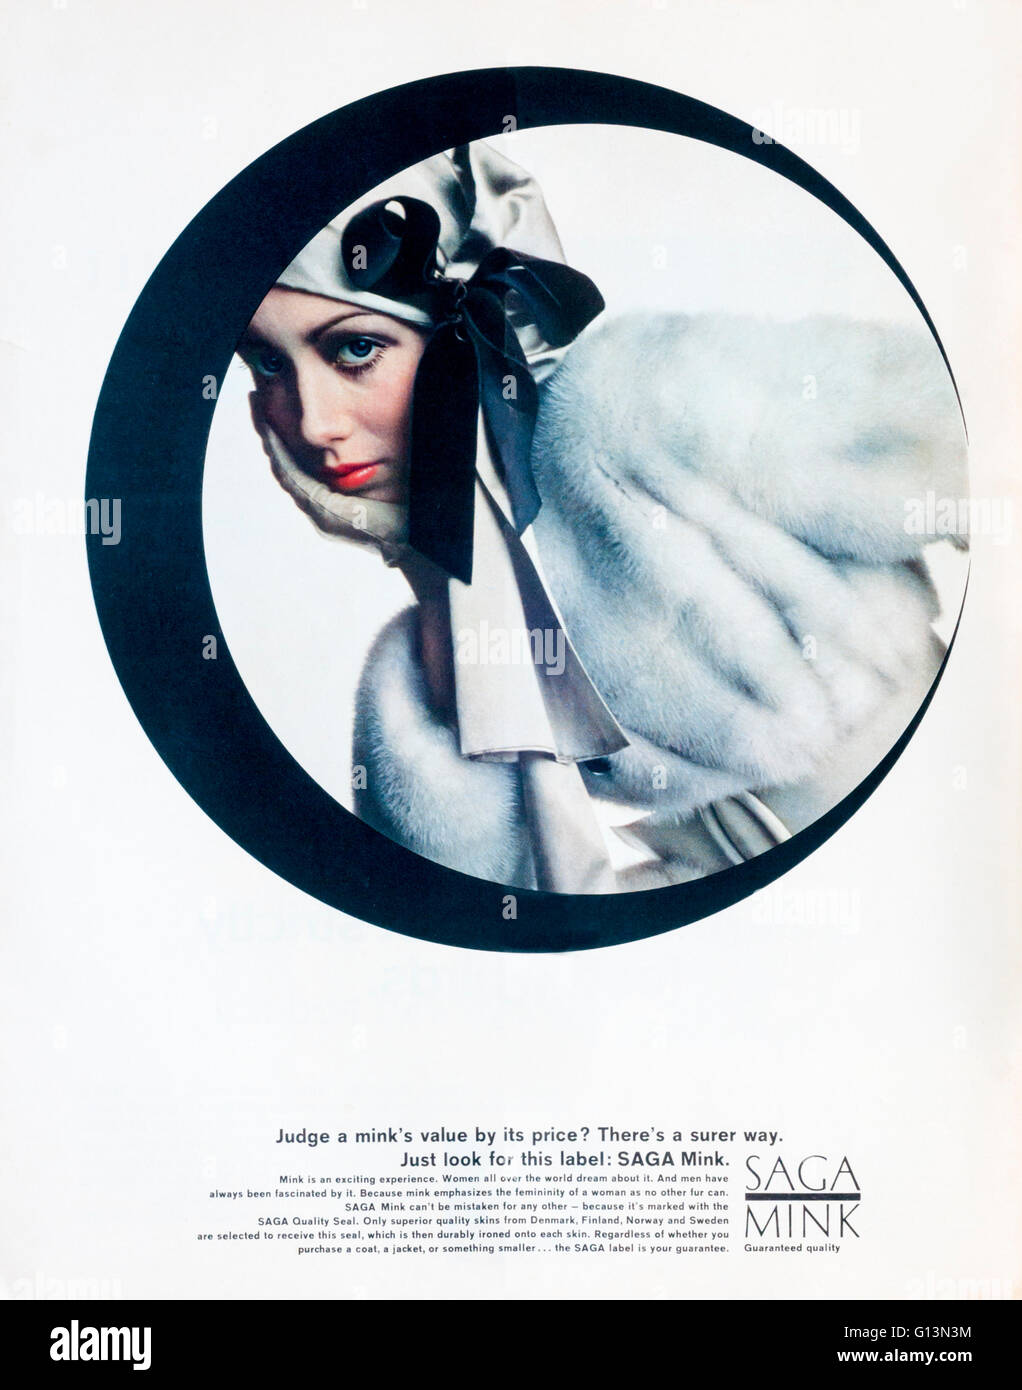 1960s magazine advertisement advertising Saga Mink furs. - Stock Image